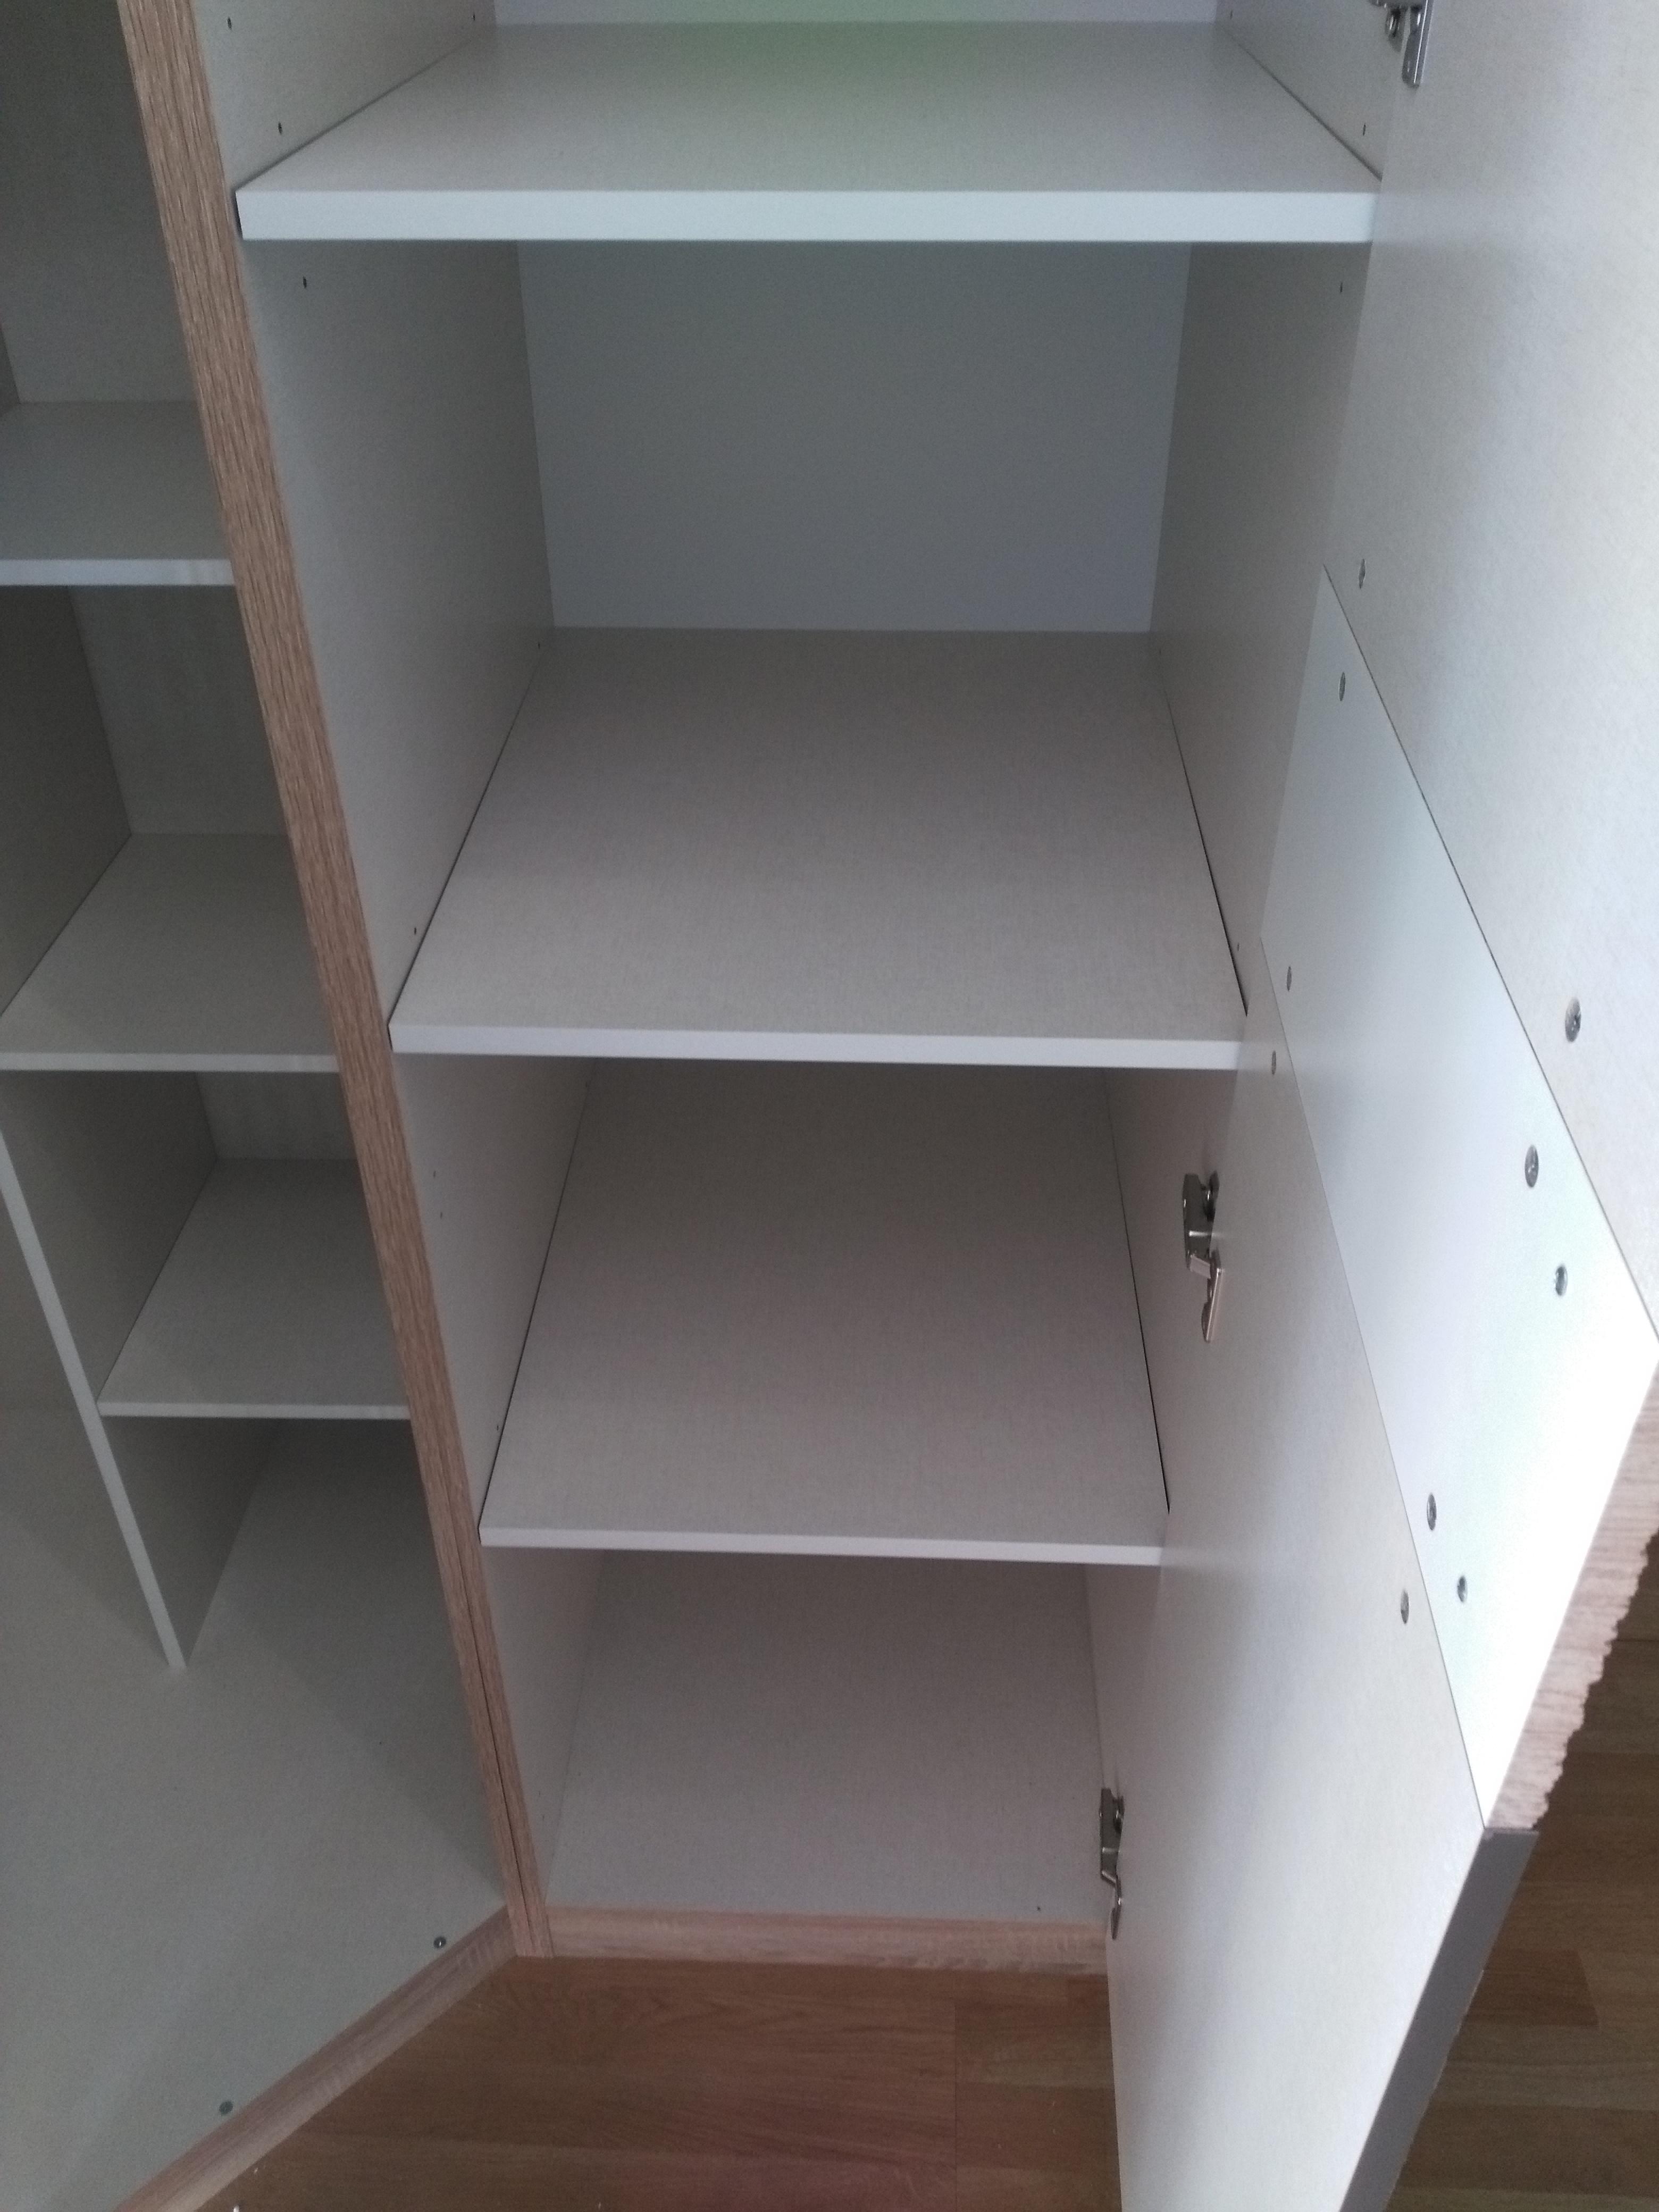 Montaż szafy BRW (Black&Red&White)